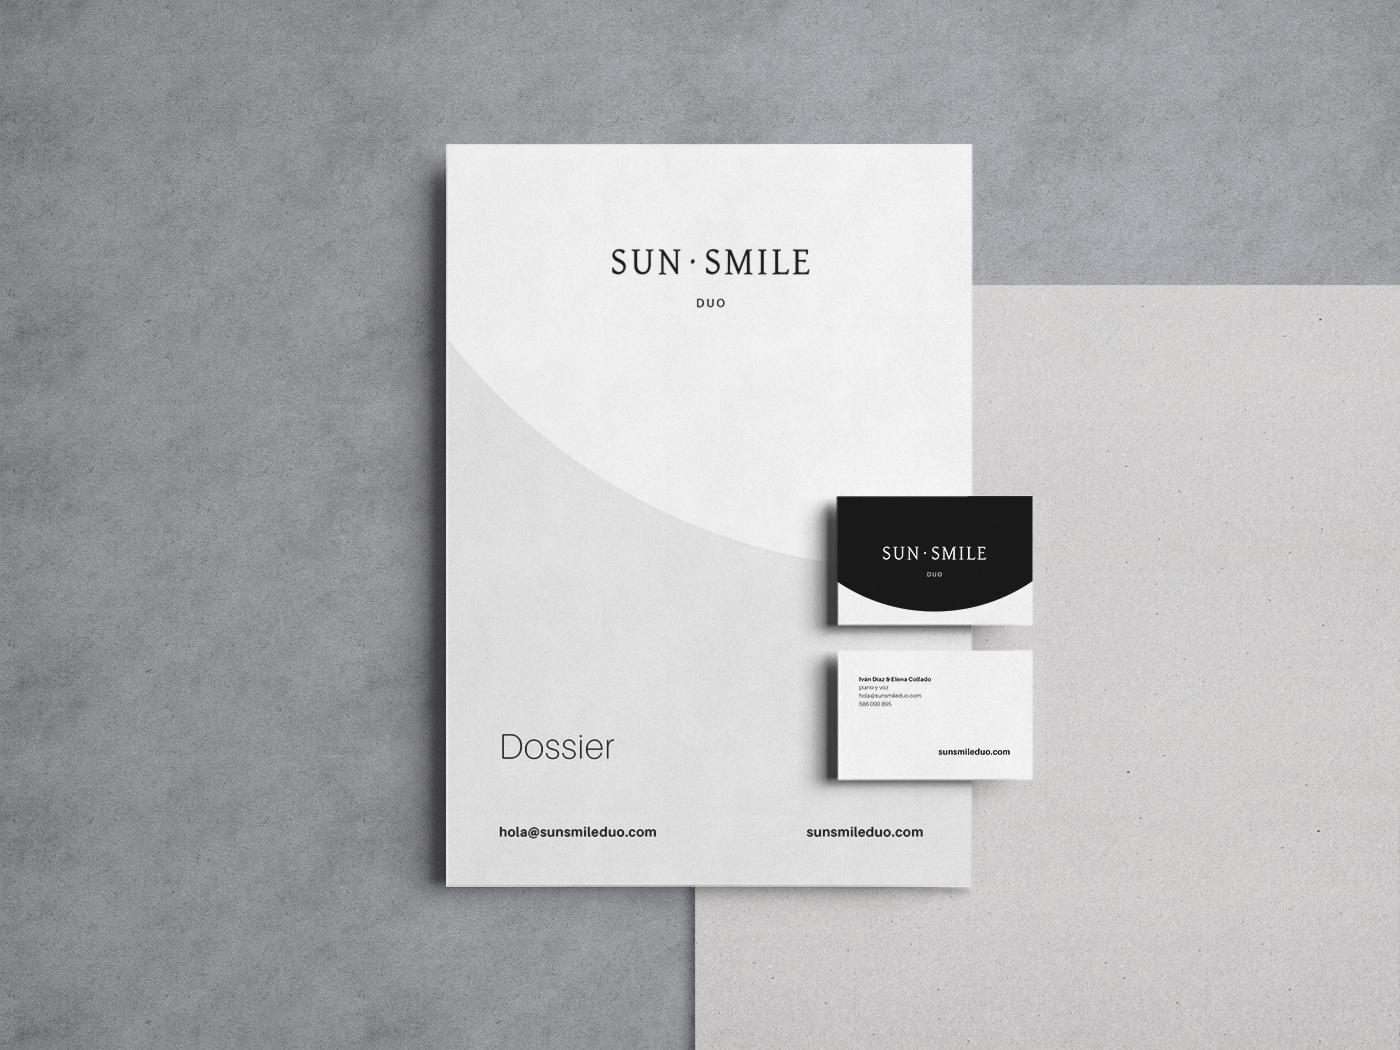 sunsmile-stationery-design-business-cards